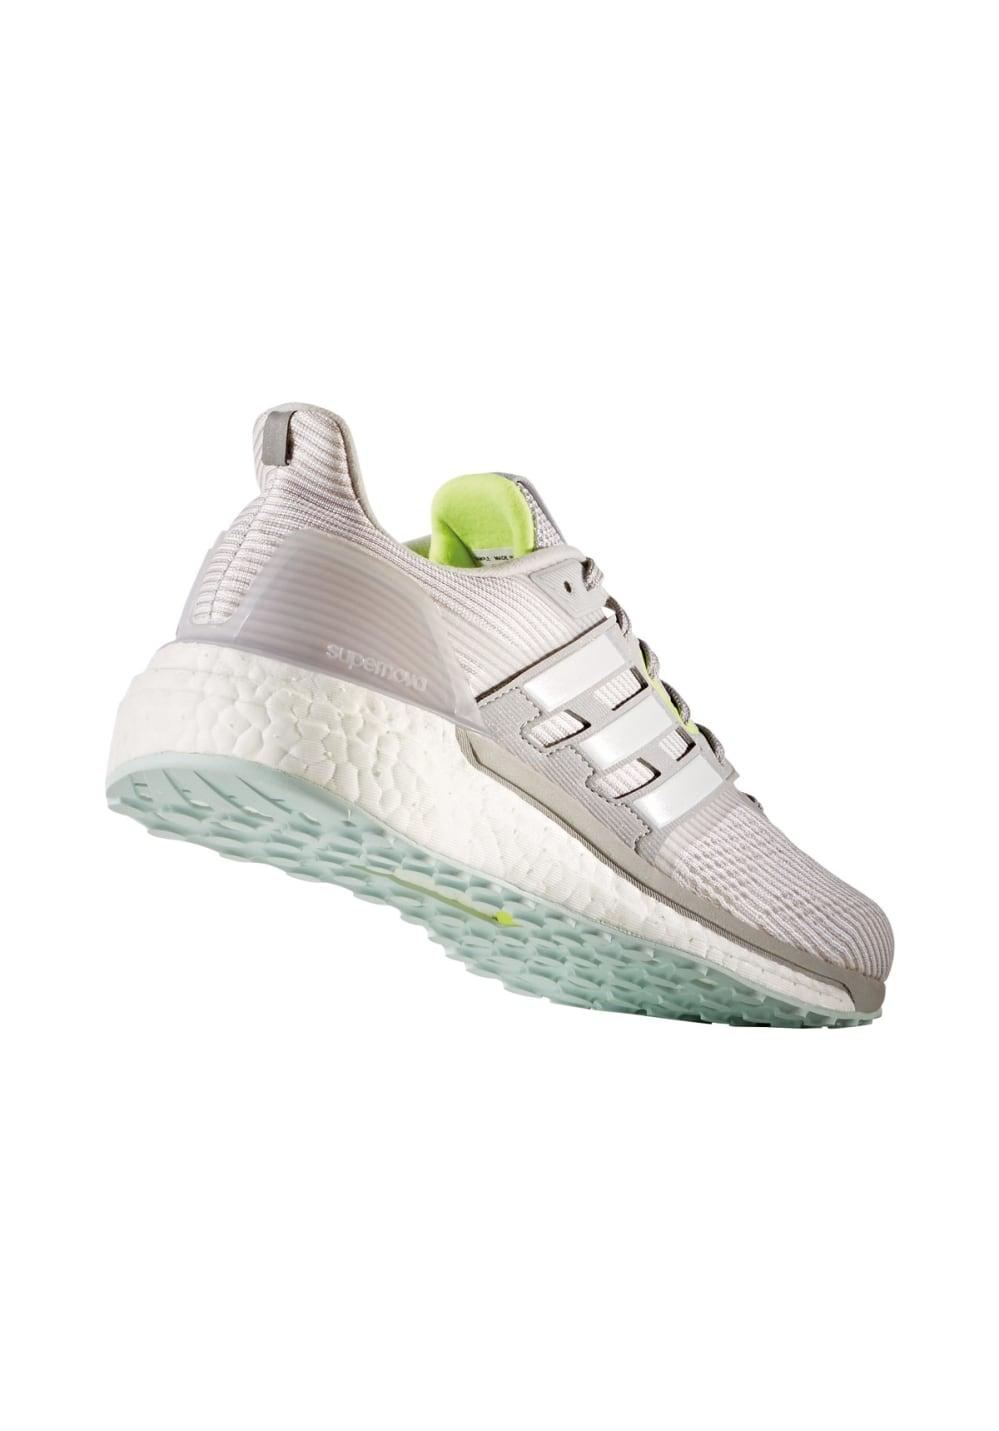 adidas Supernova - Laufschuhe für Damen - Grau